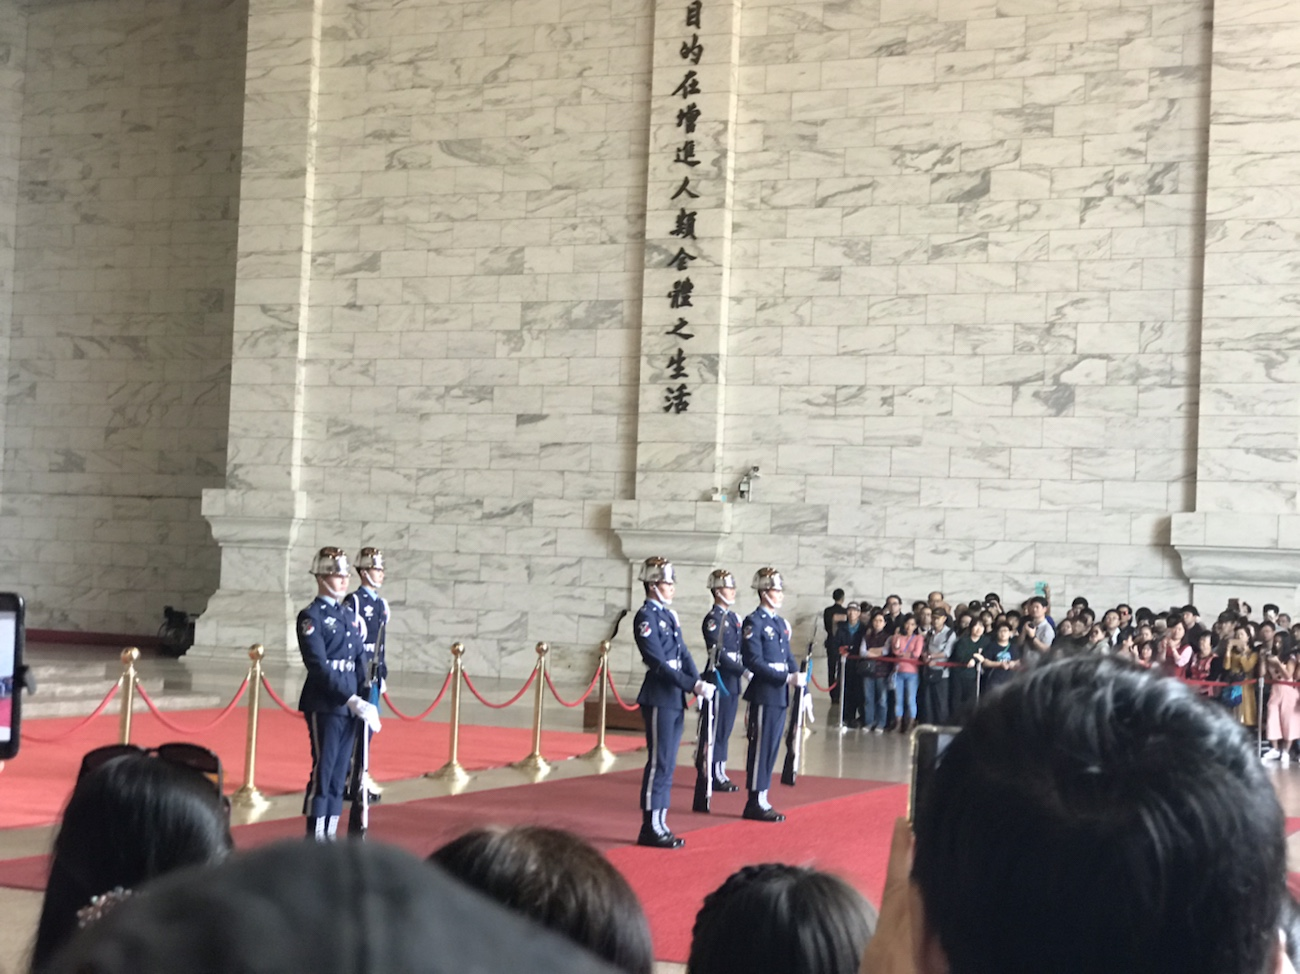 中正記念堂 衛兵交代式の様子